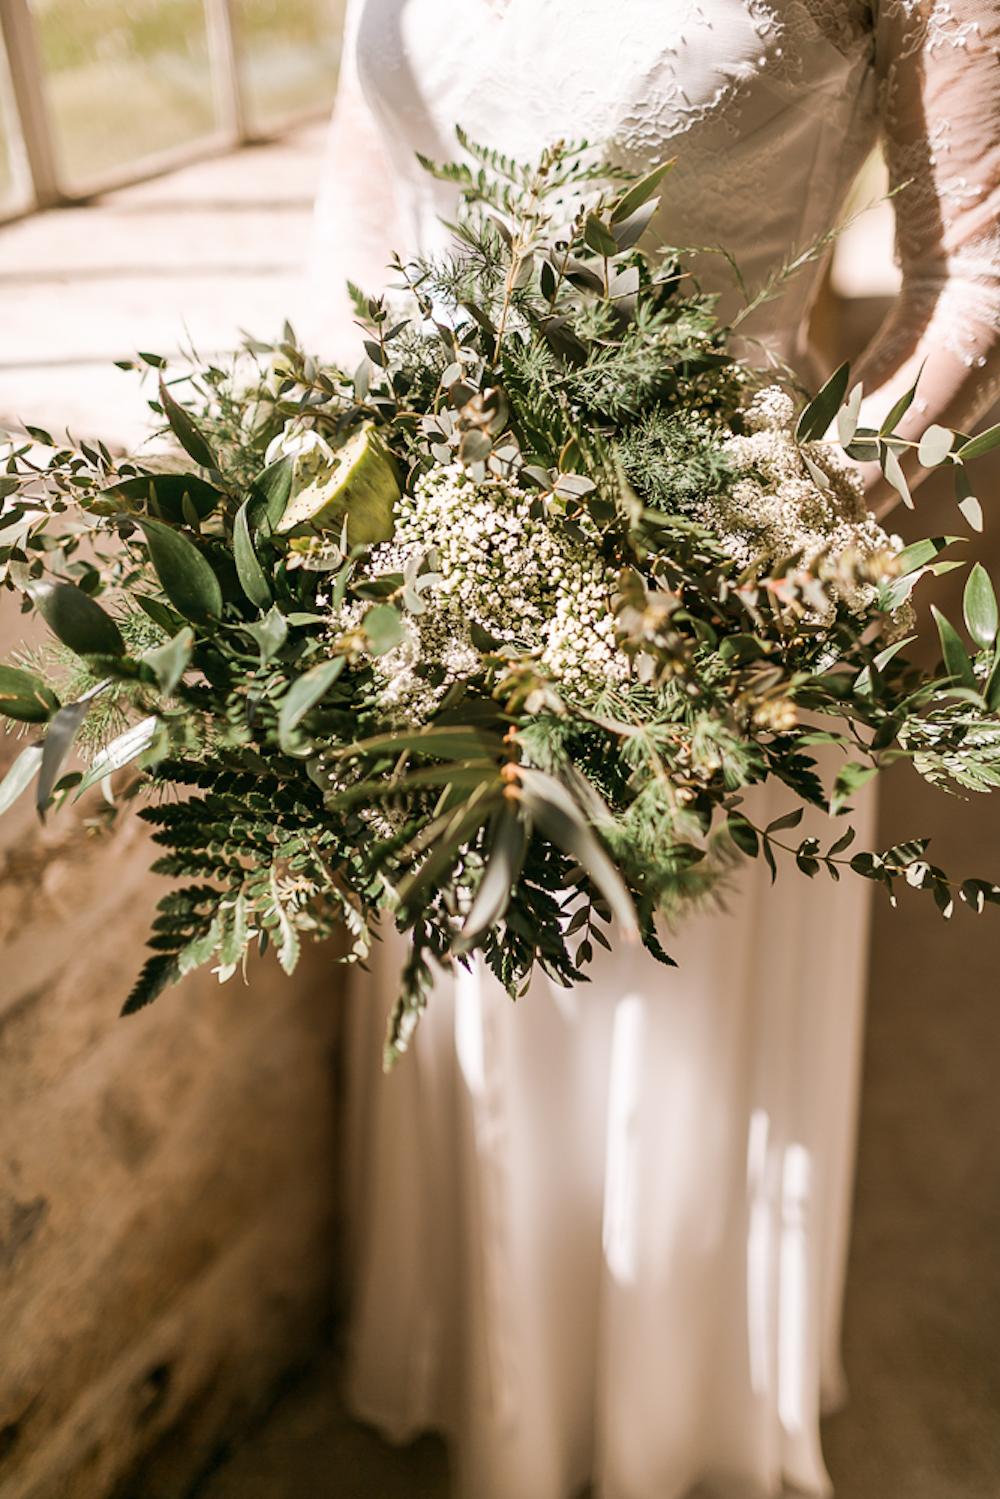 parisian-inspired-blog-mariage-shooting-inspiration-vegetal-abbaye-trois-fontaines-marne-cg-photographie-27.jpg